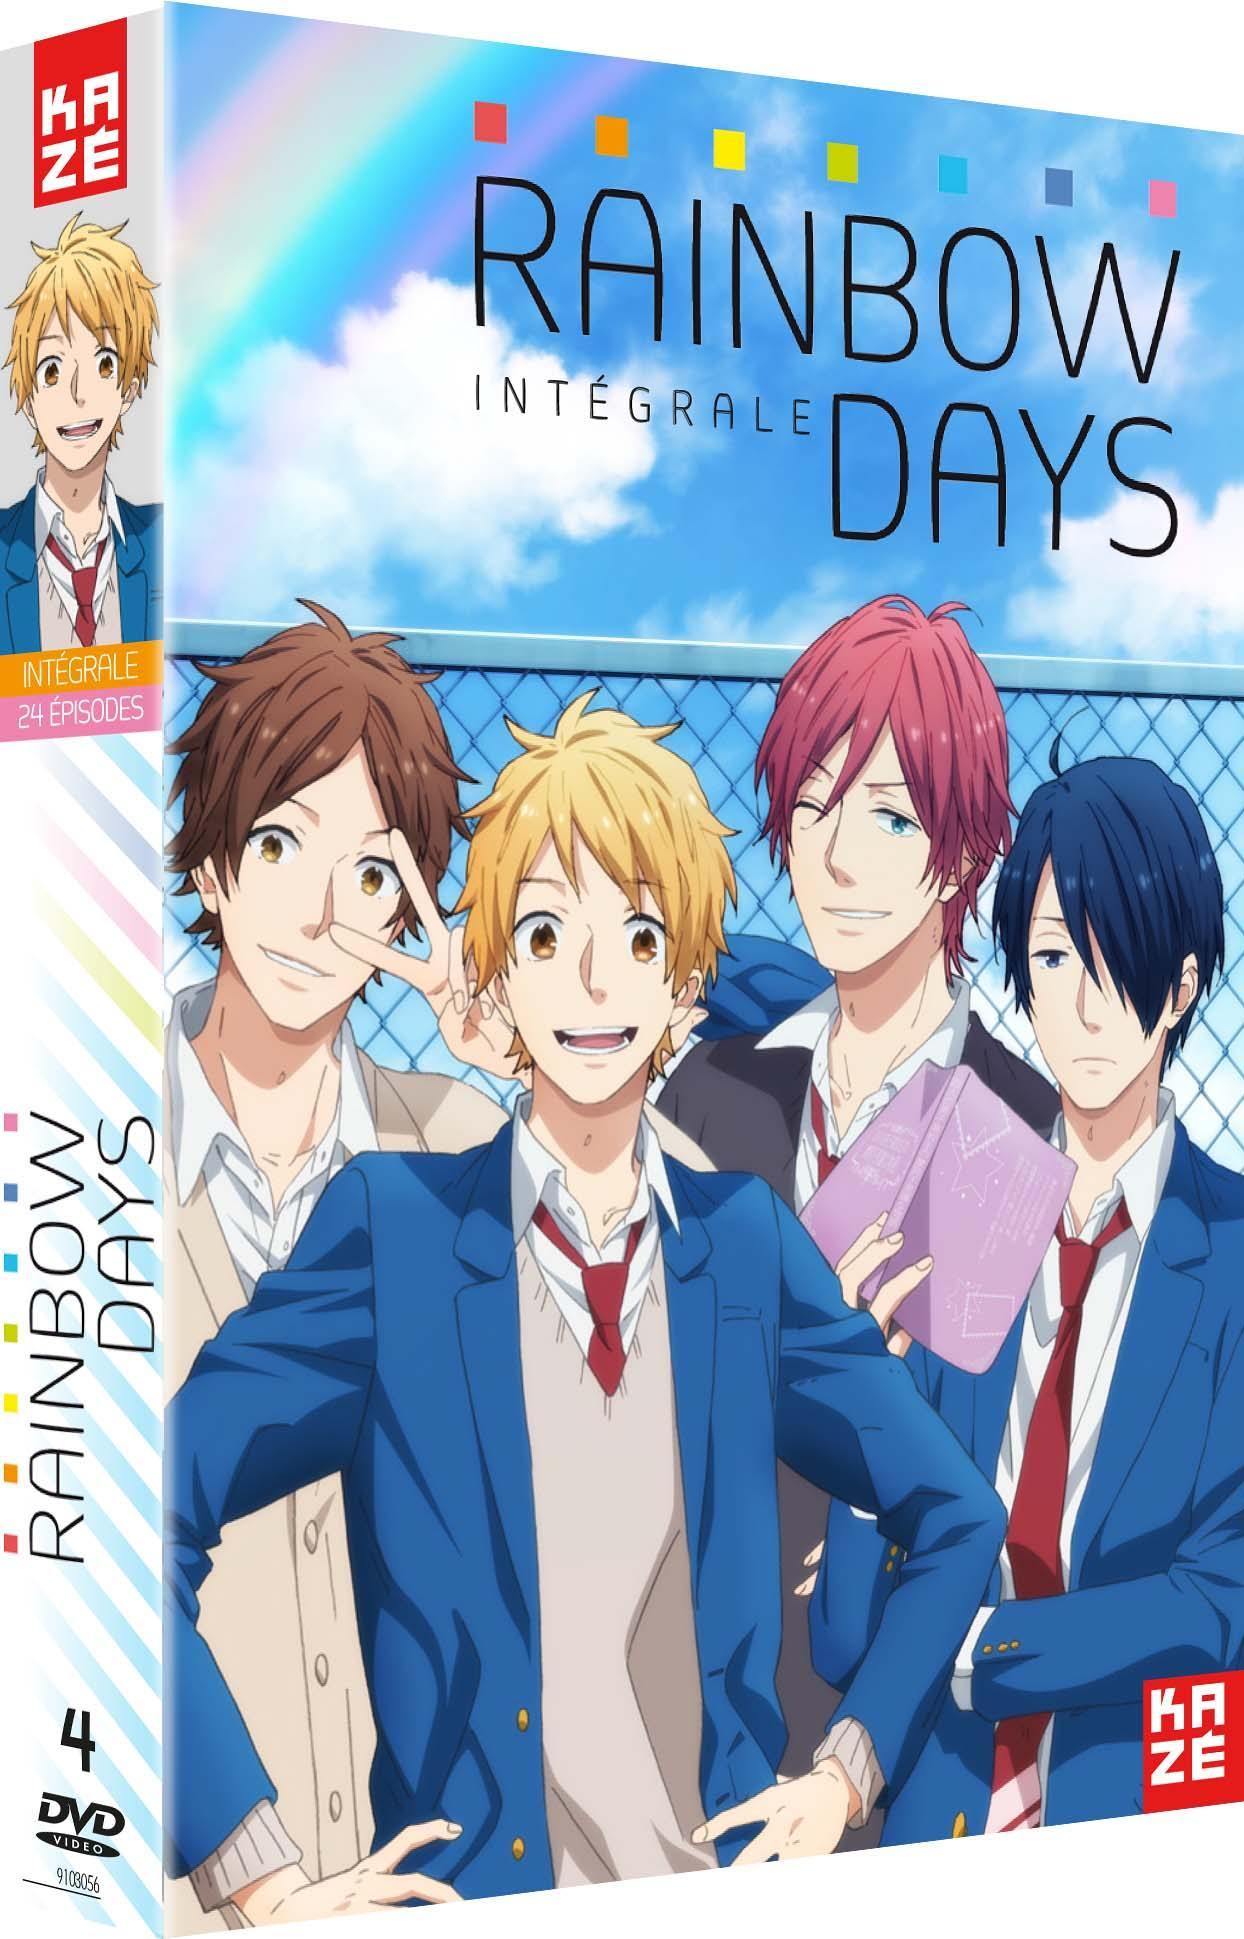 Rainbow days - integrale serie - 4 dvd